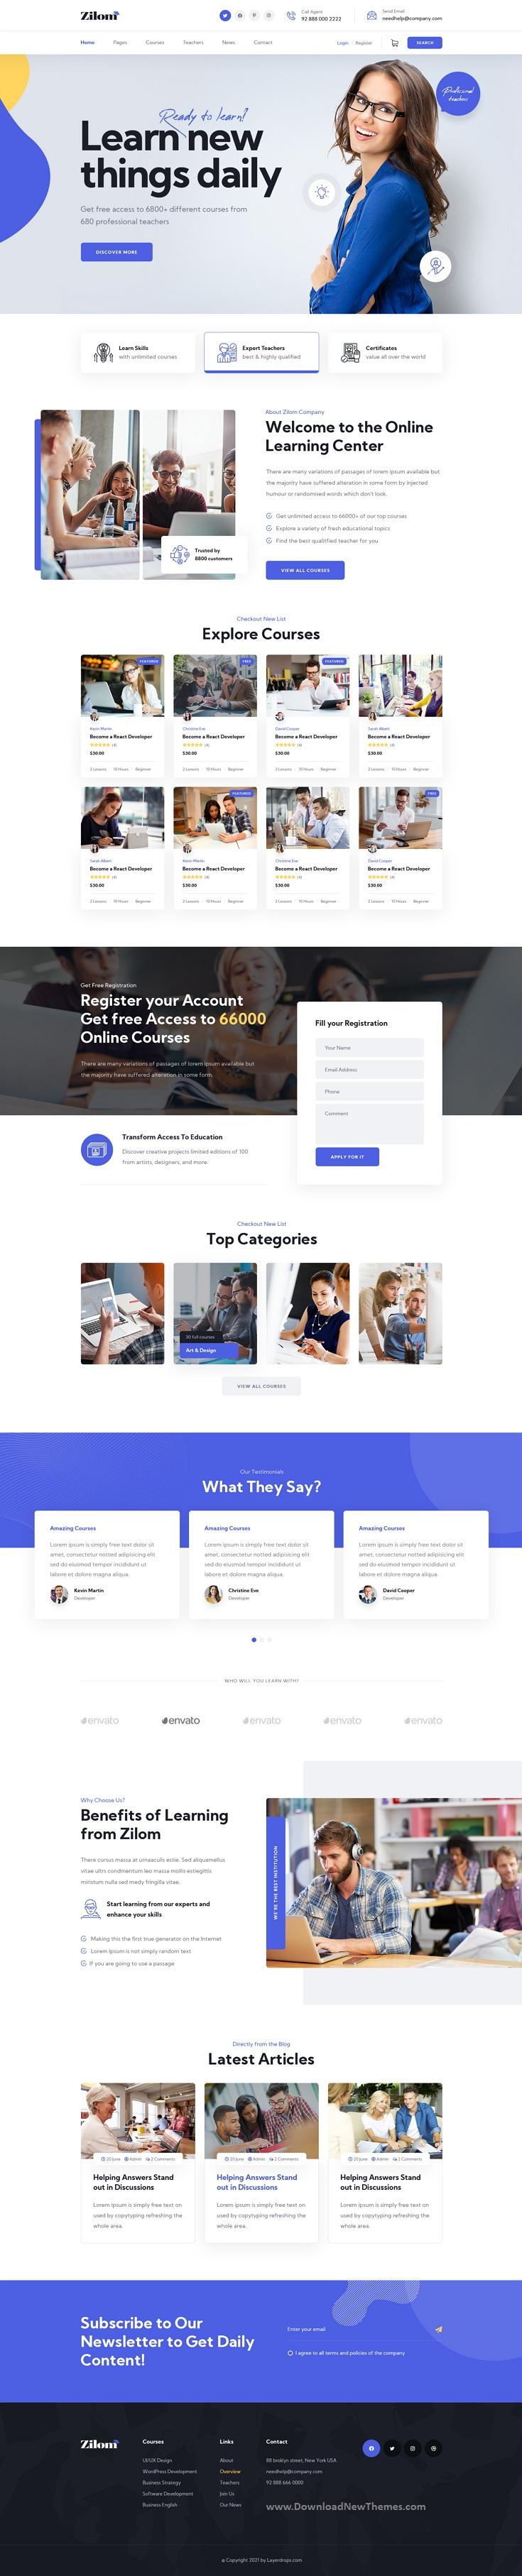 Online Education Learning Photshop Template